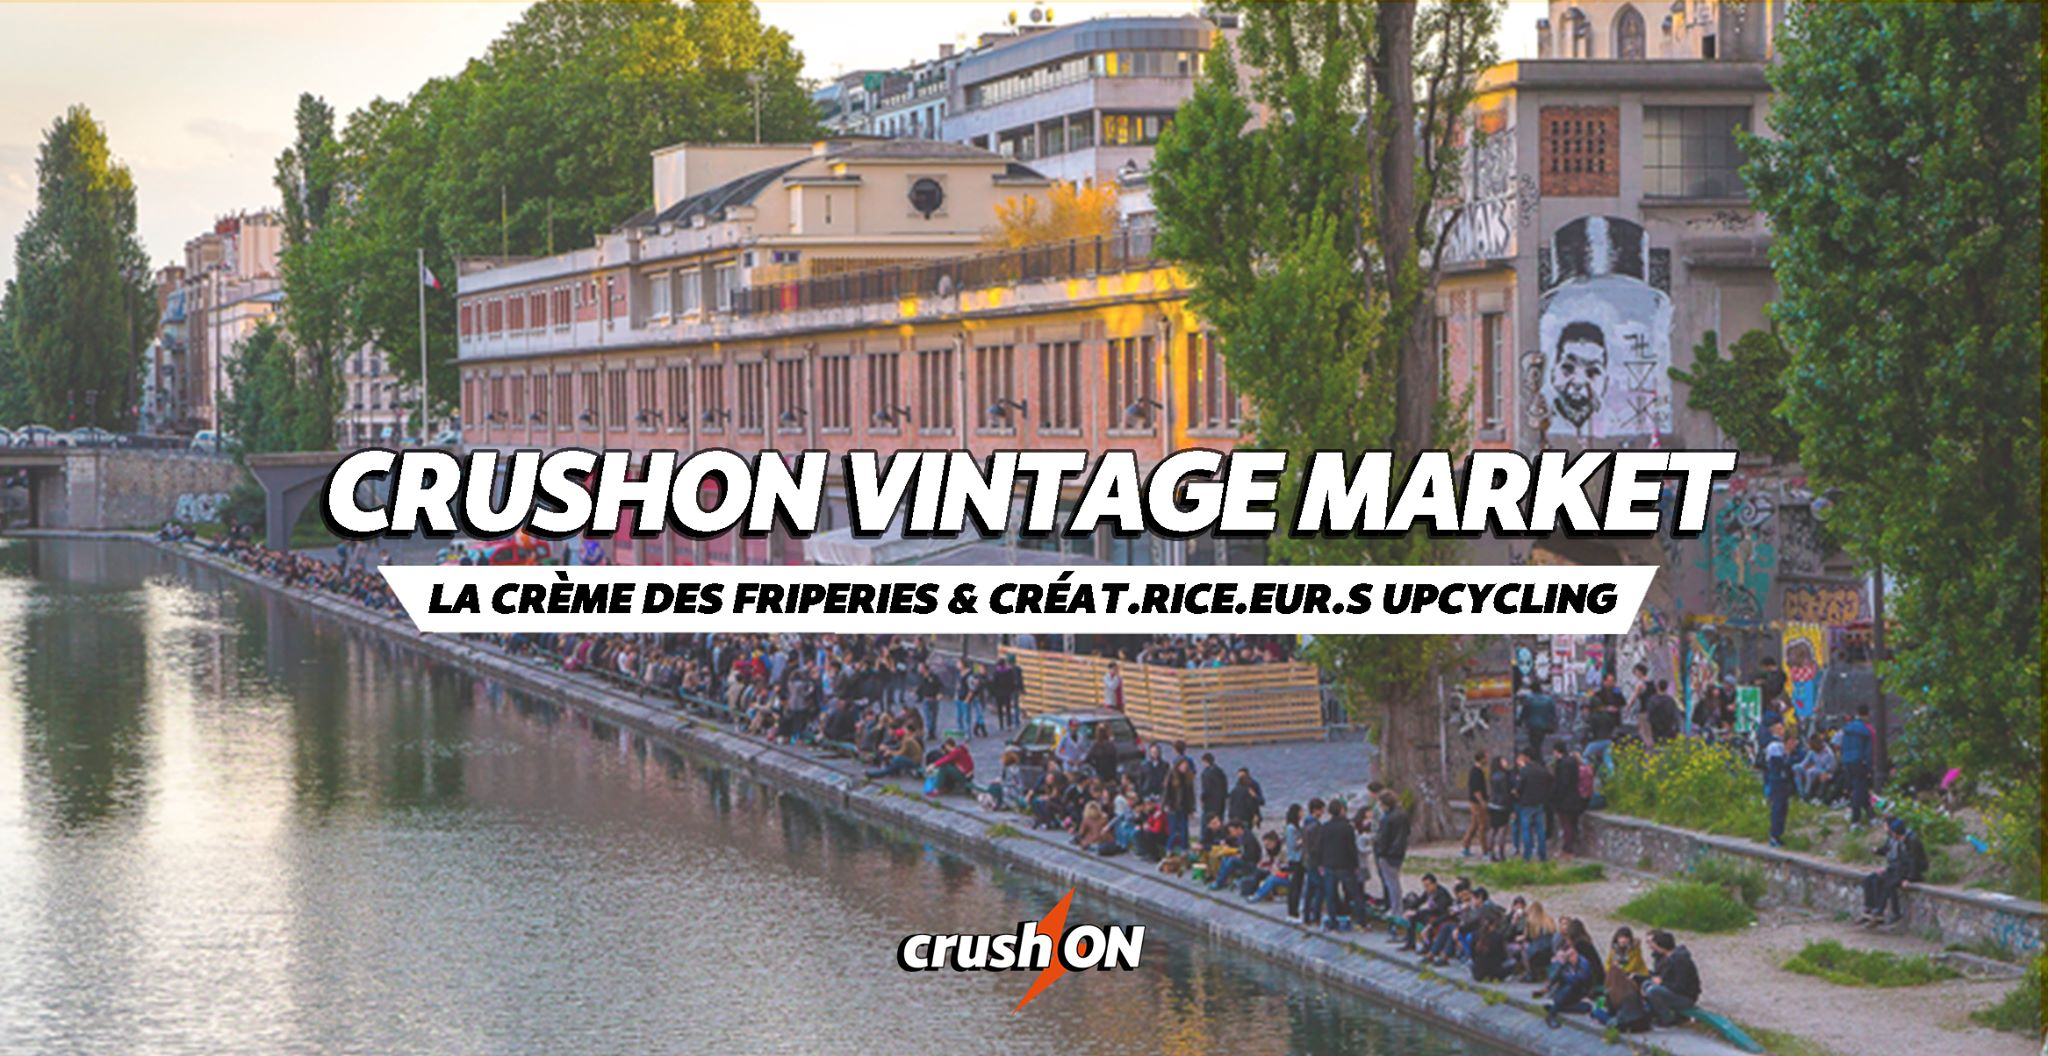 CrushON Vintage Market